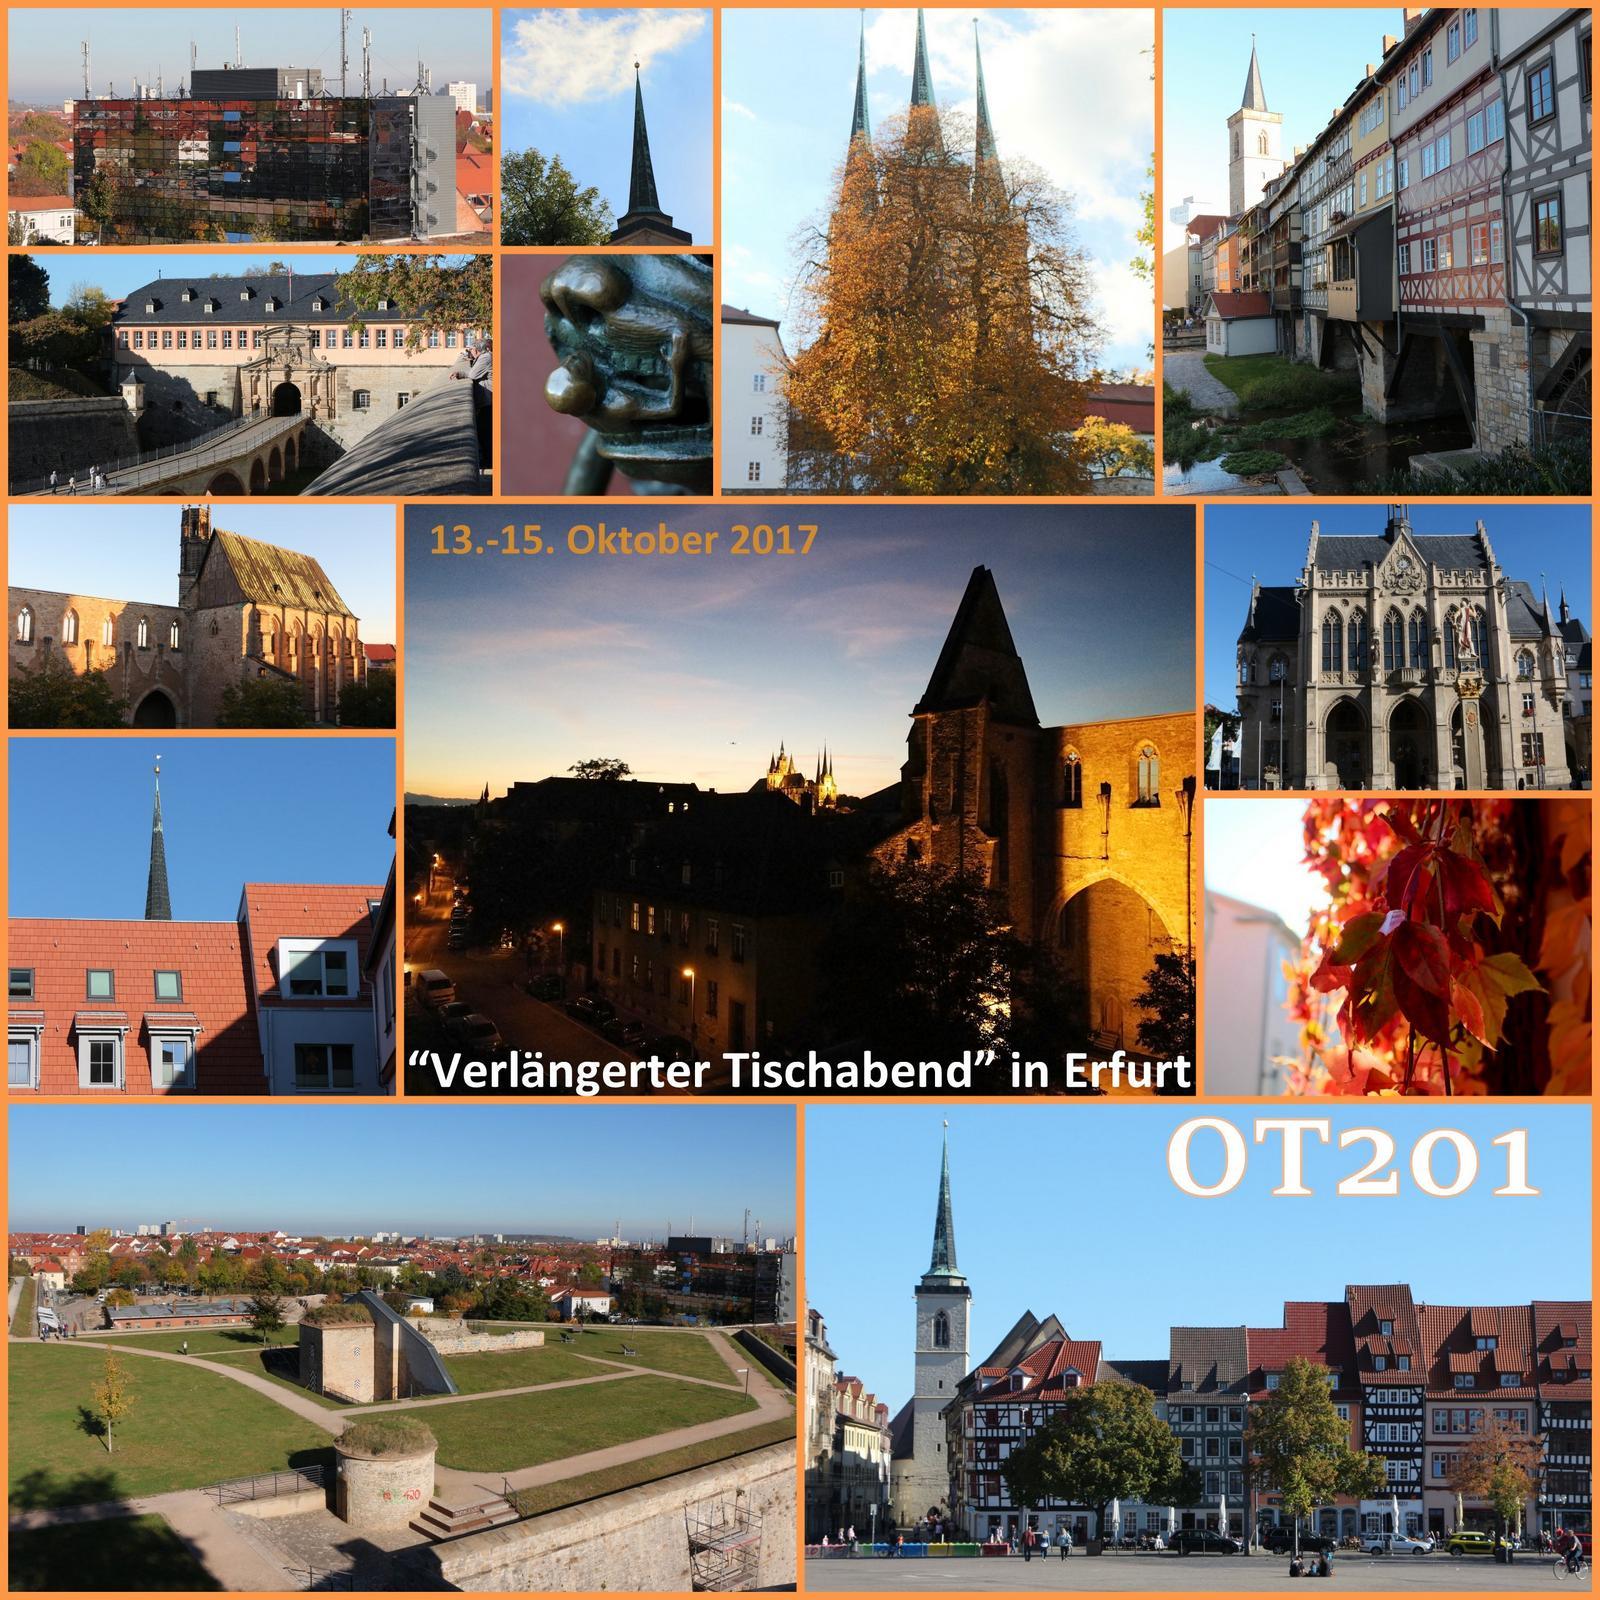 01-01-2017-10-14_OT201_Erfurt